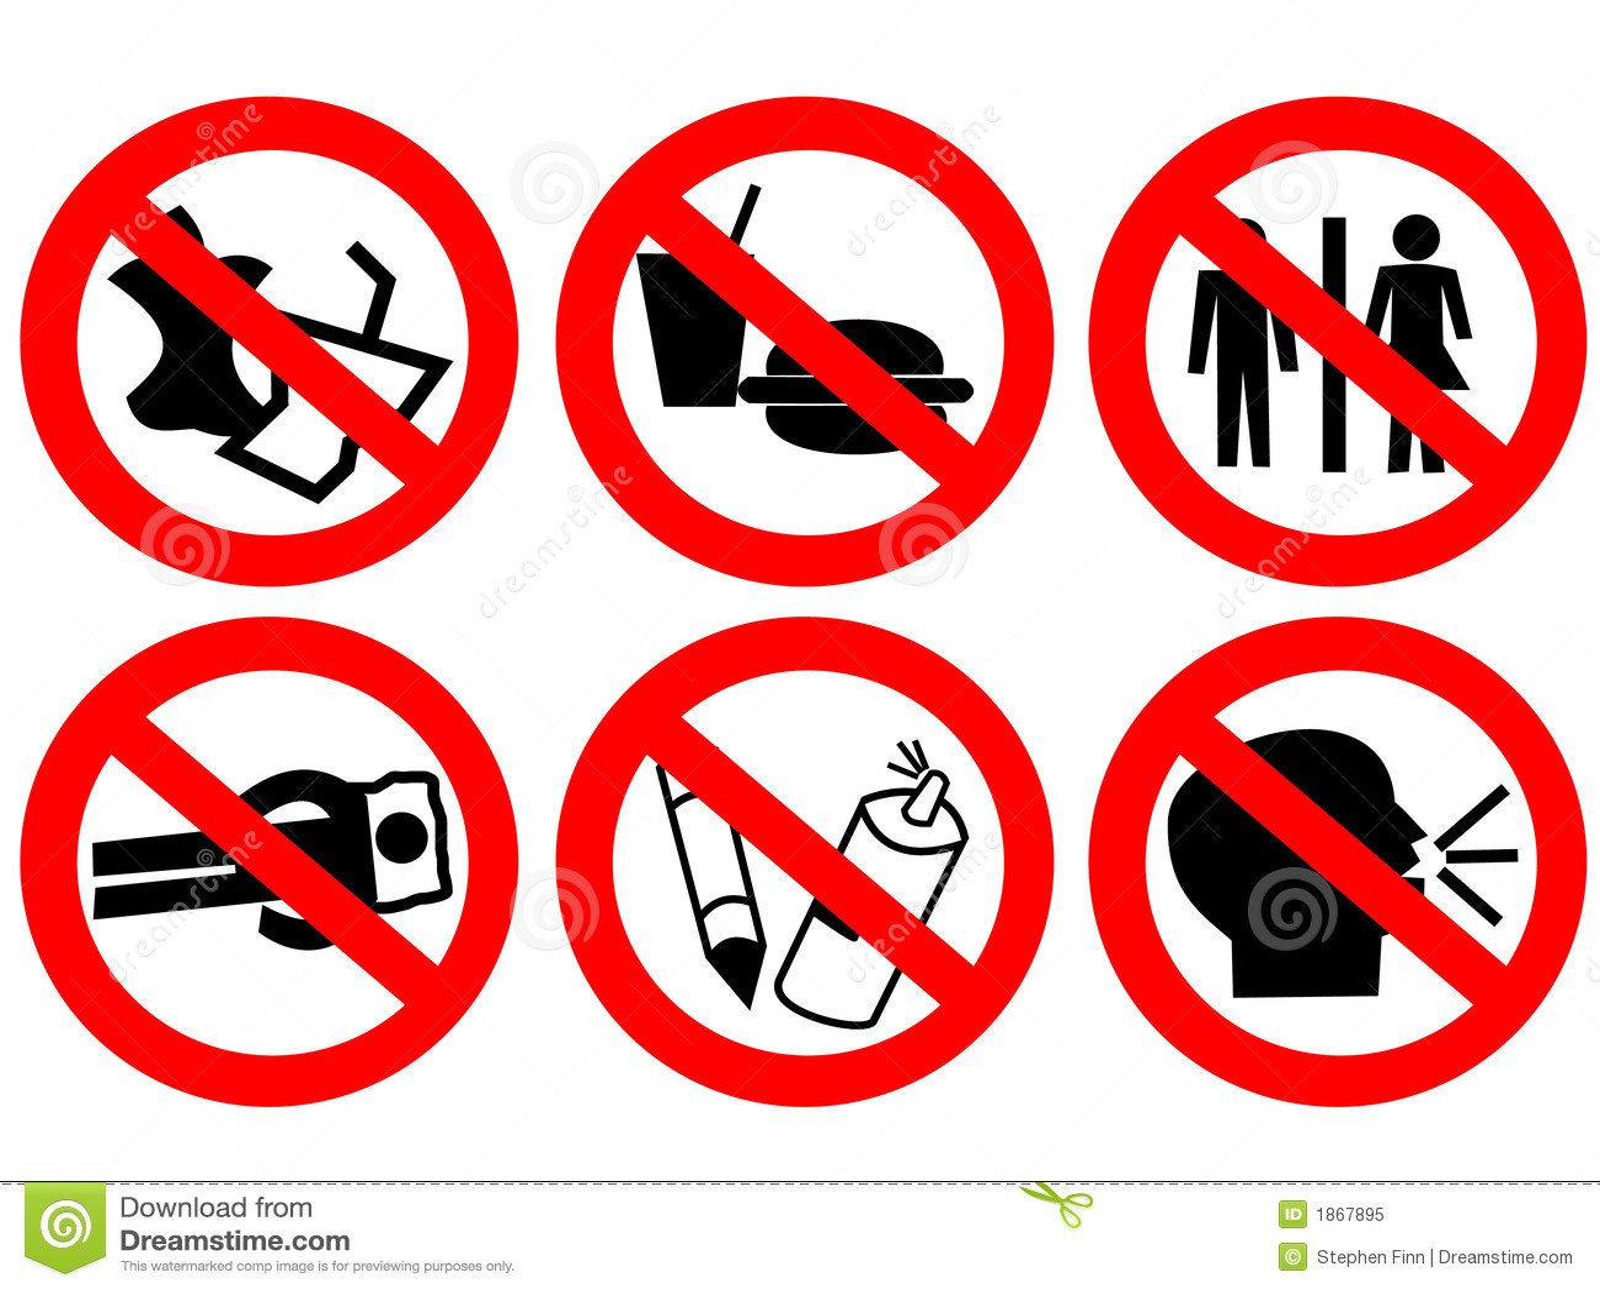 Public Space Prohibited Sign Stock Illustration